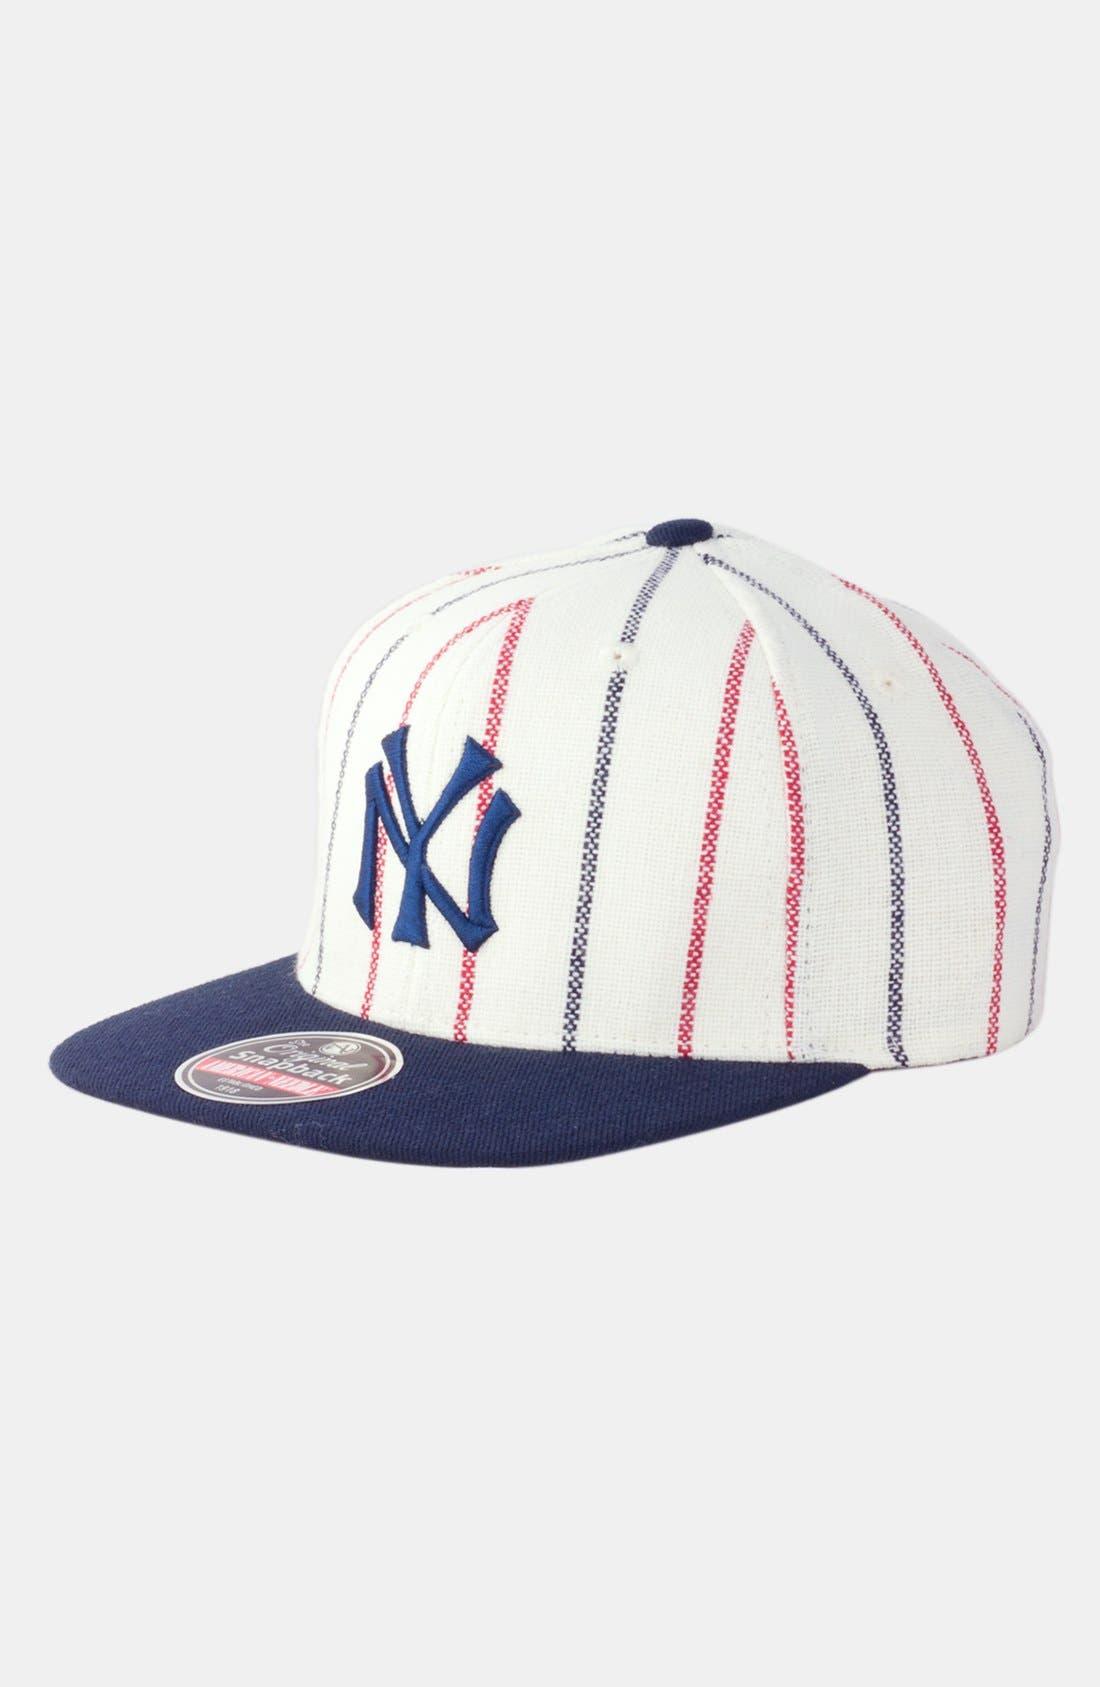 Main Image - American Needle 'New York Yankees 1916 - 400 Series' Snapback Baseball Cap